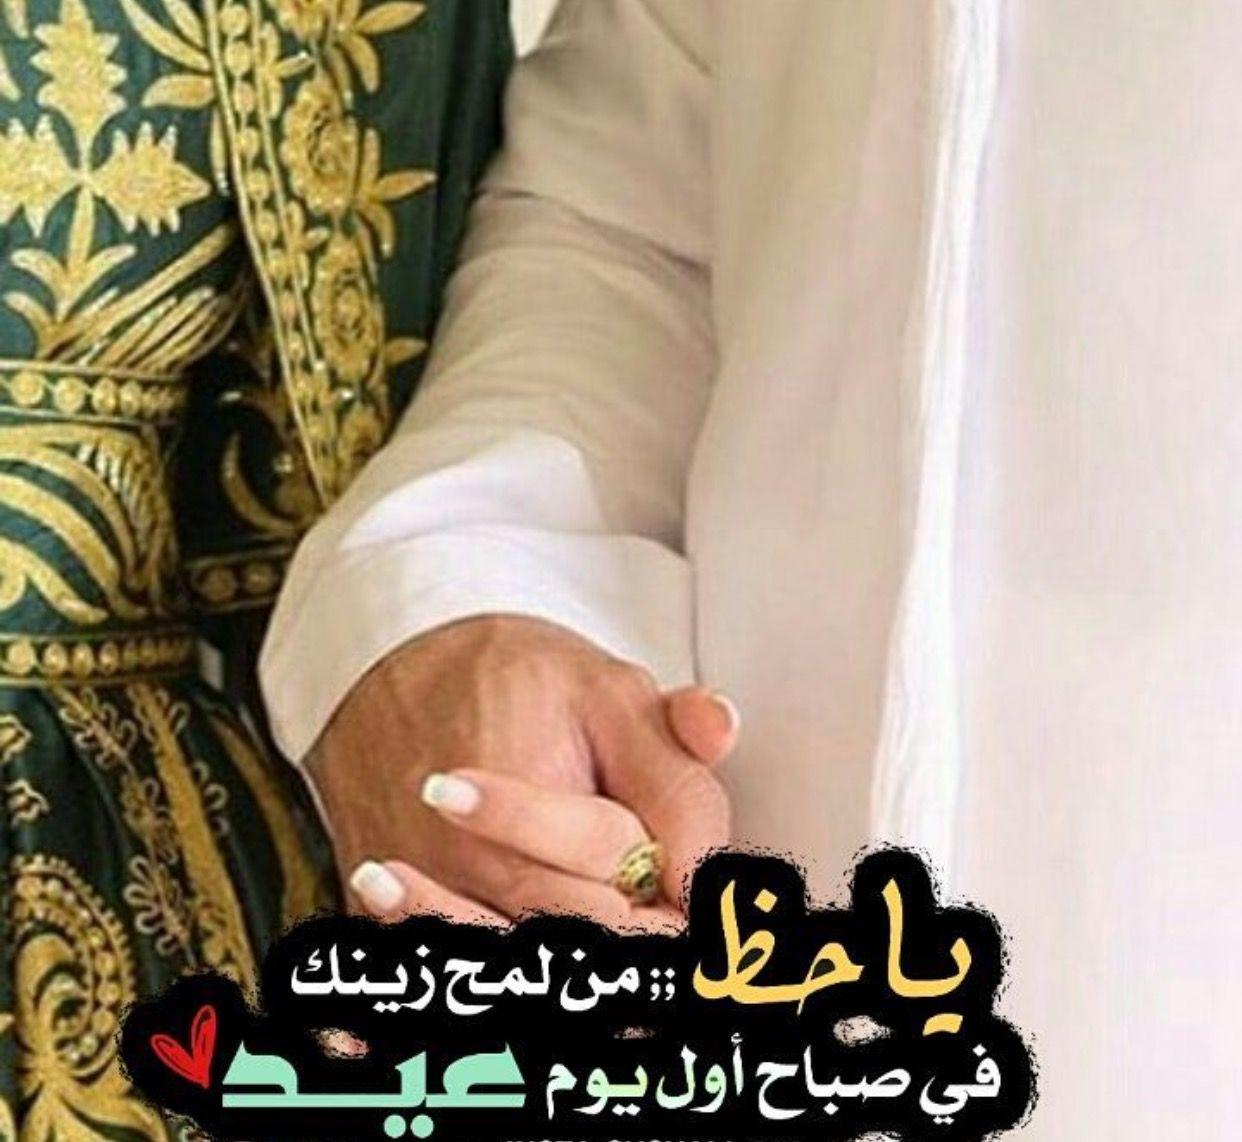 Pin By بنت محمد On عيدي أنت Holding Hands Love Hands